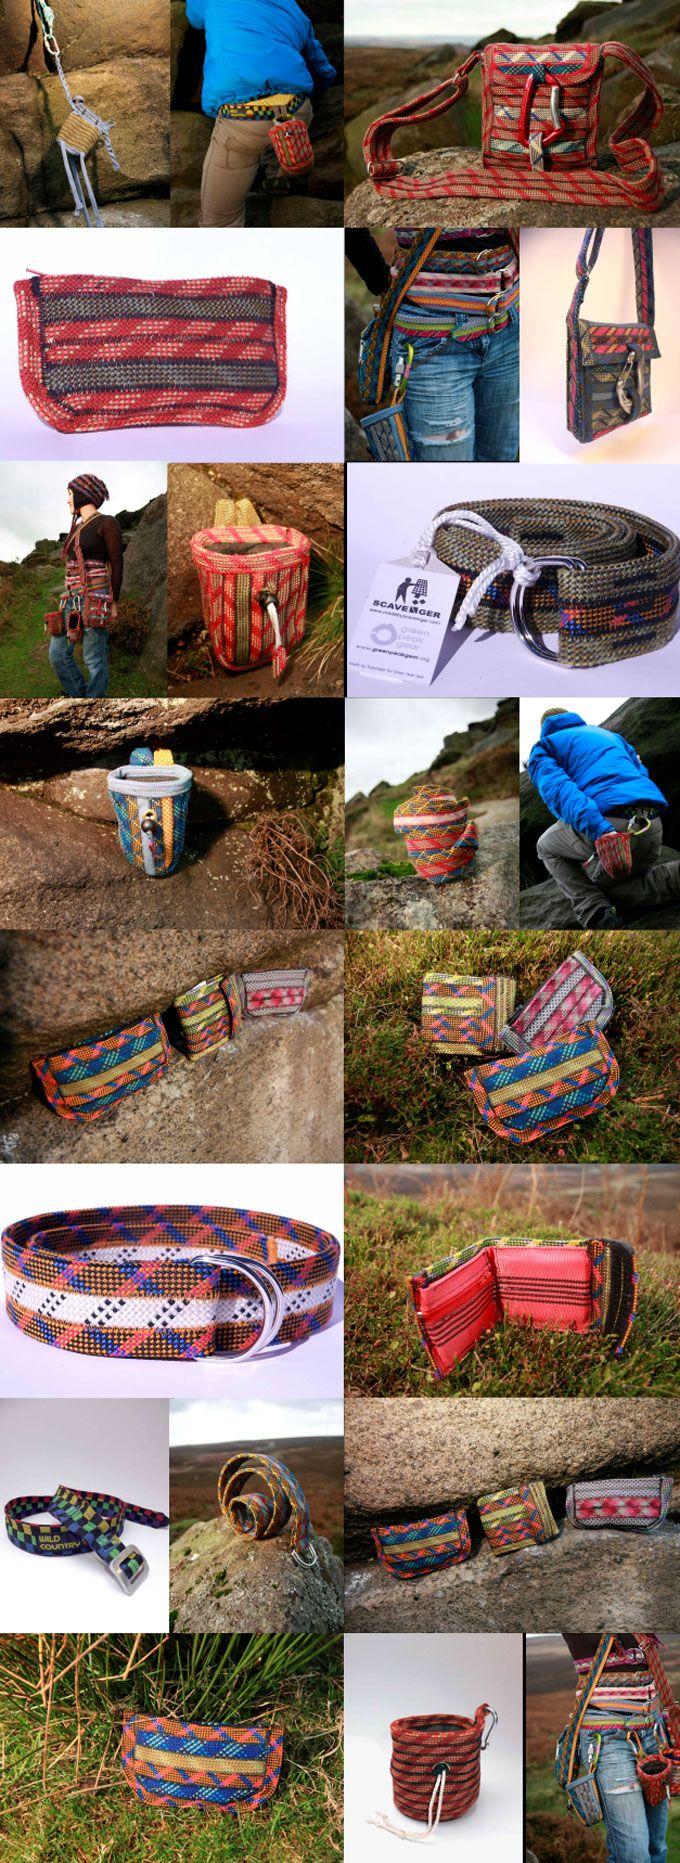 Scavenger, recycled rock climbing gear